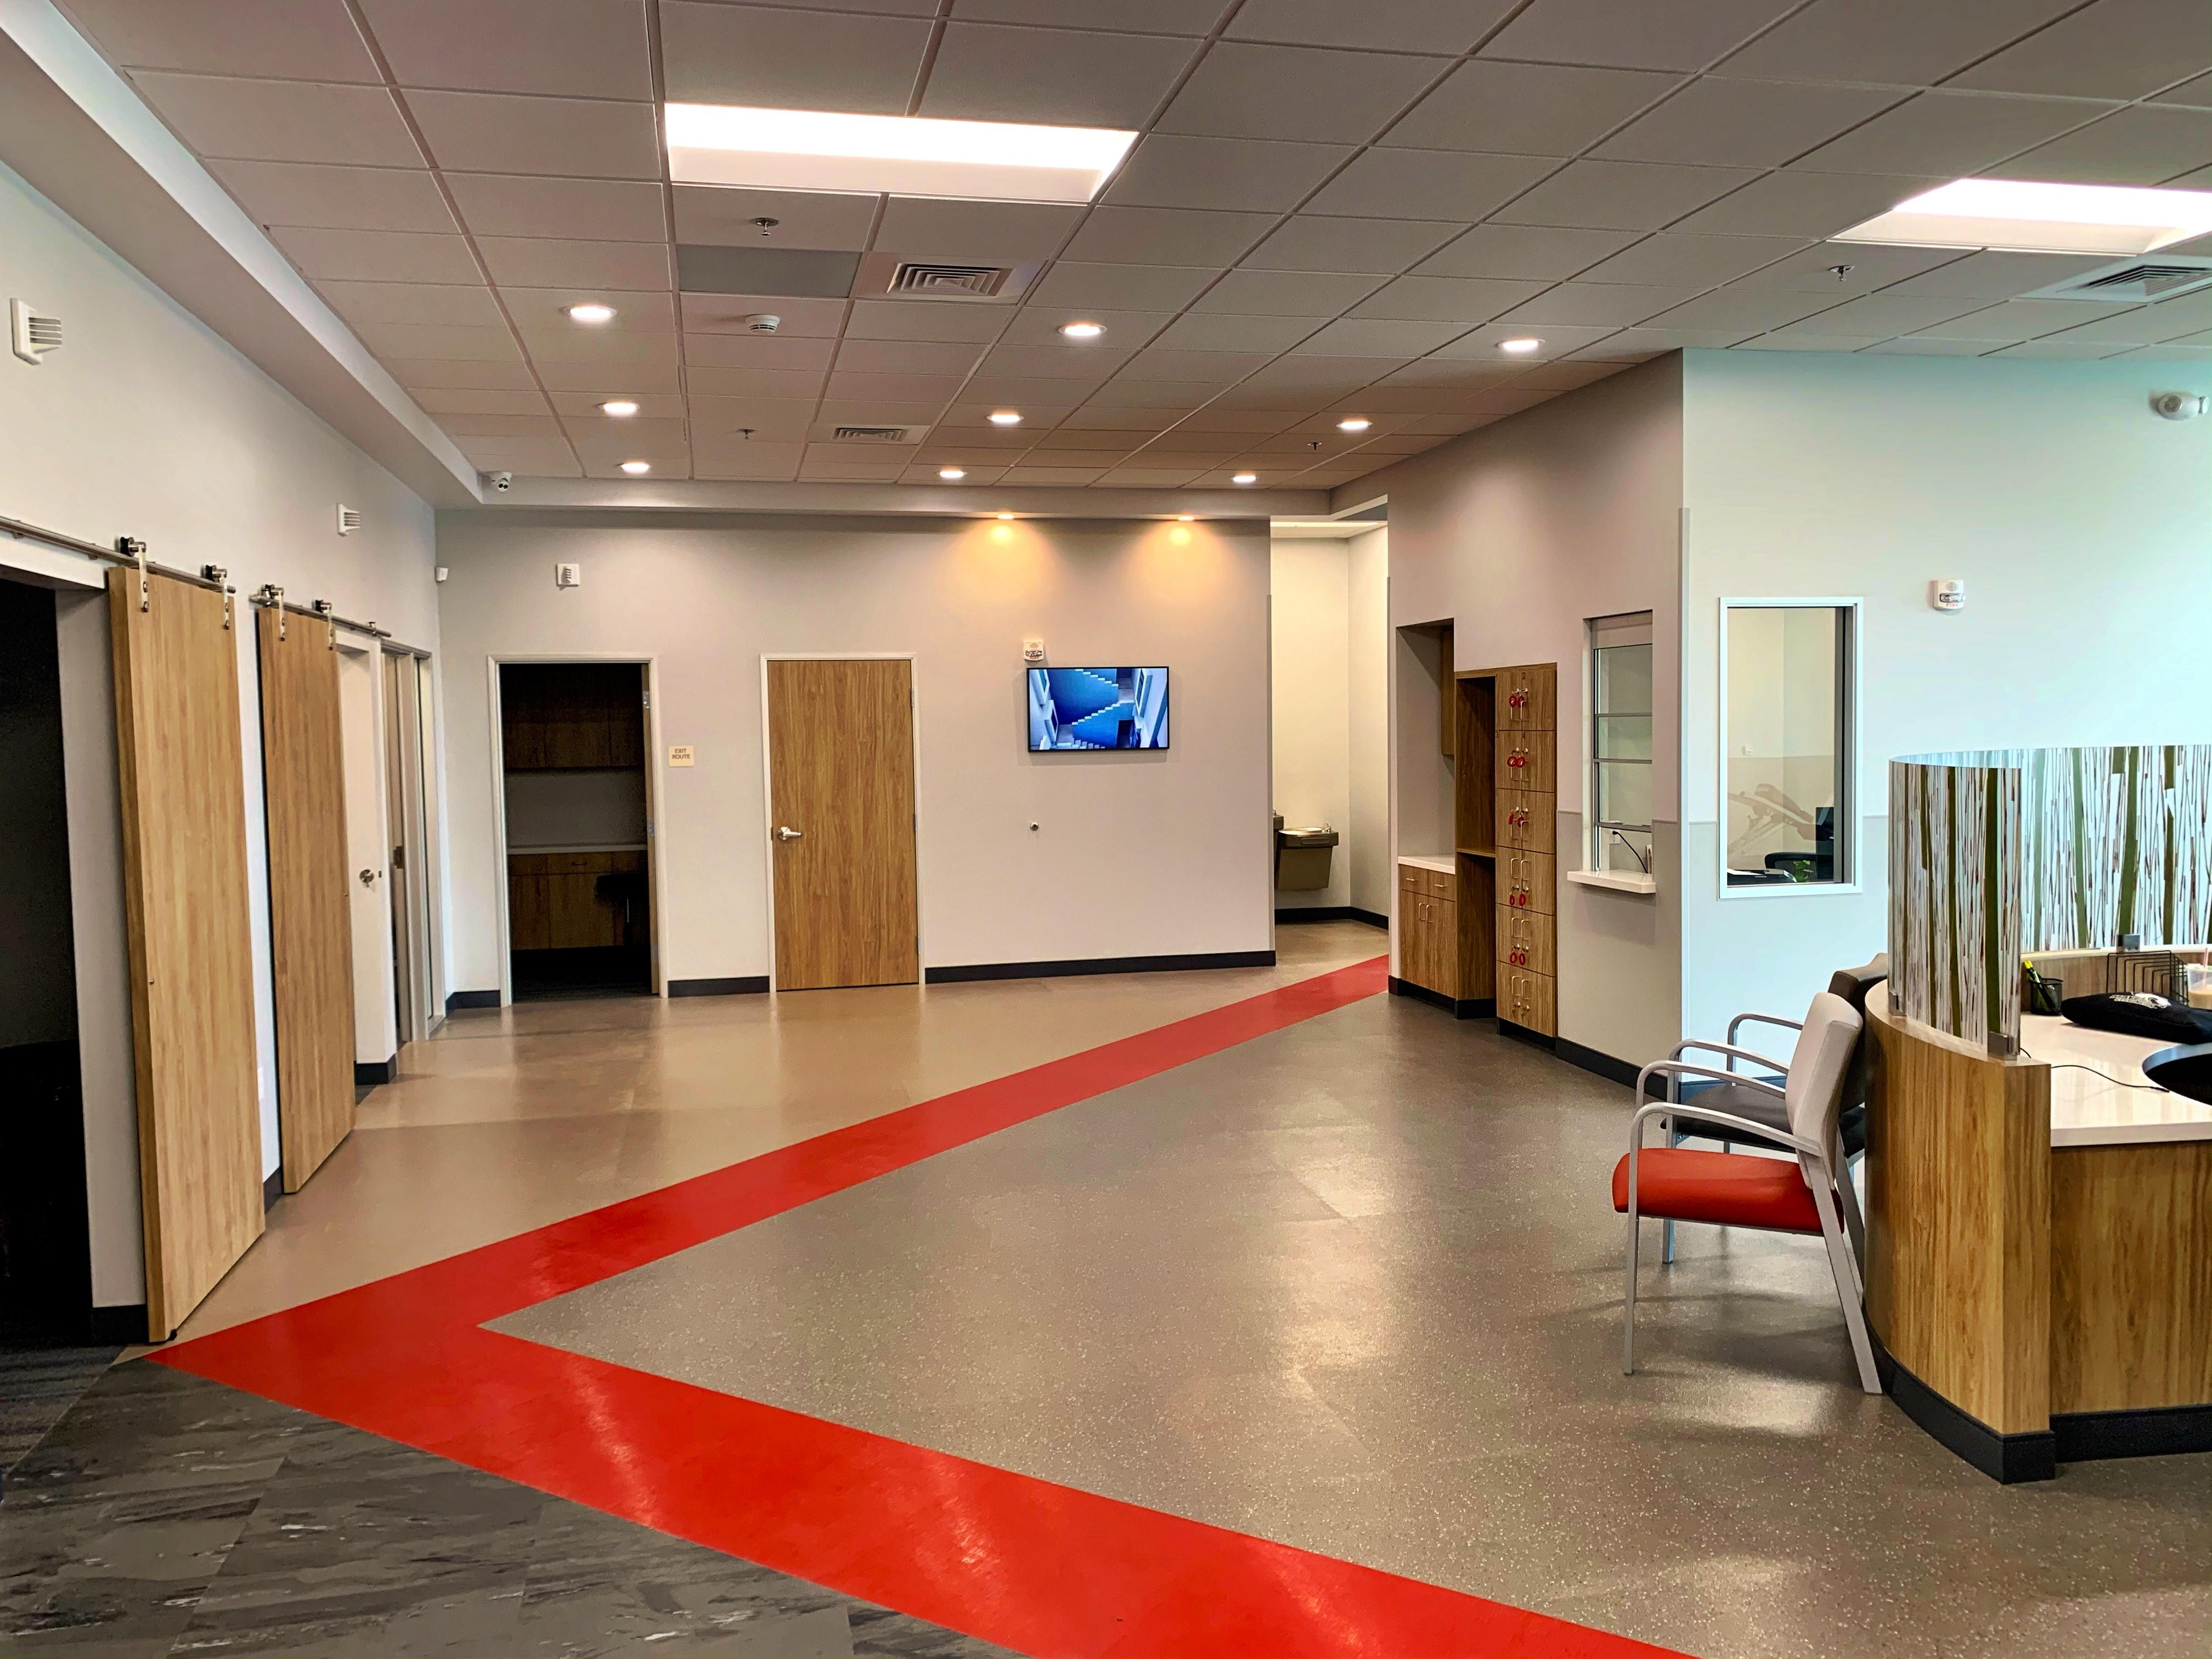 Pair & Marotta Physical Therapy - Buena Vista - Bakersfield, CA 93311 - (661)282-8737 | ShowMeLocal.com